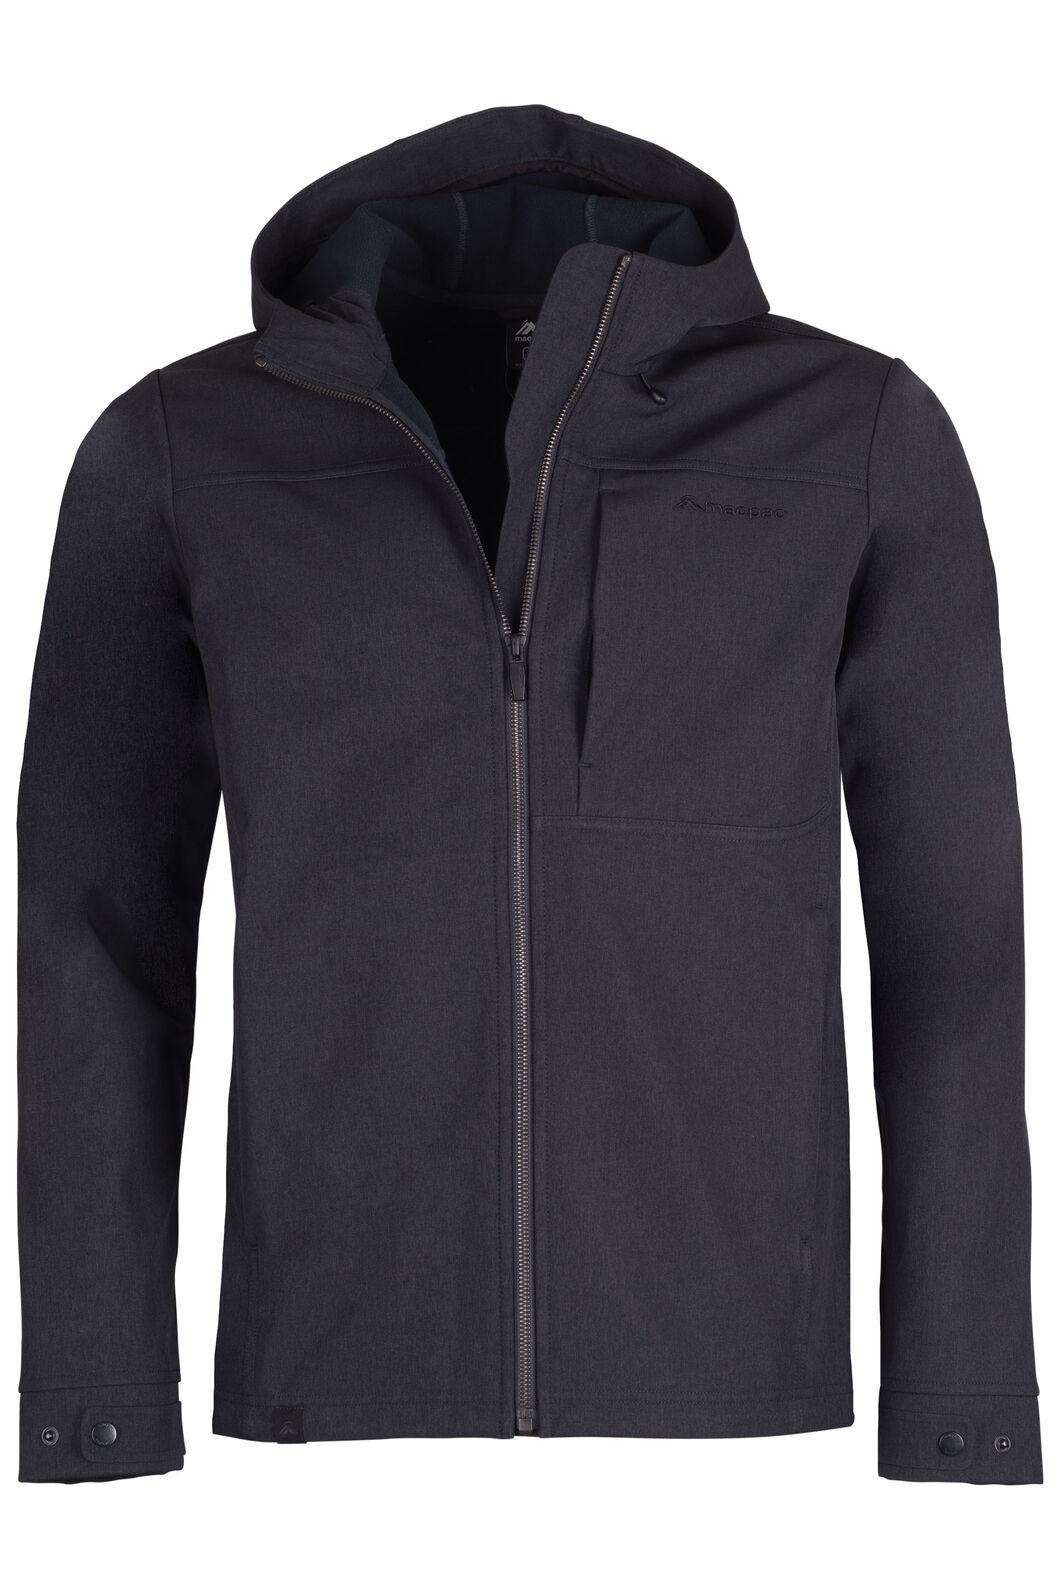 Chord Hooded Softshell Jacket - Men's, Black, hi-res